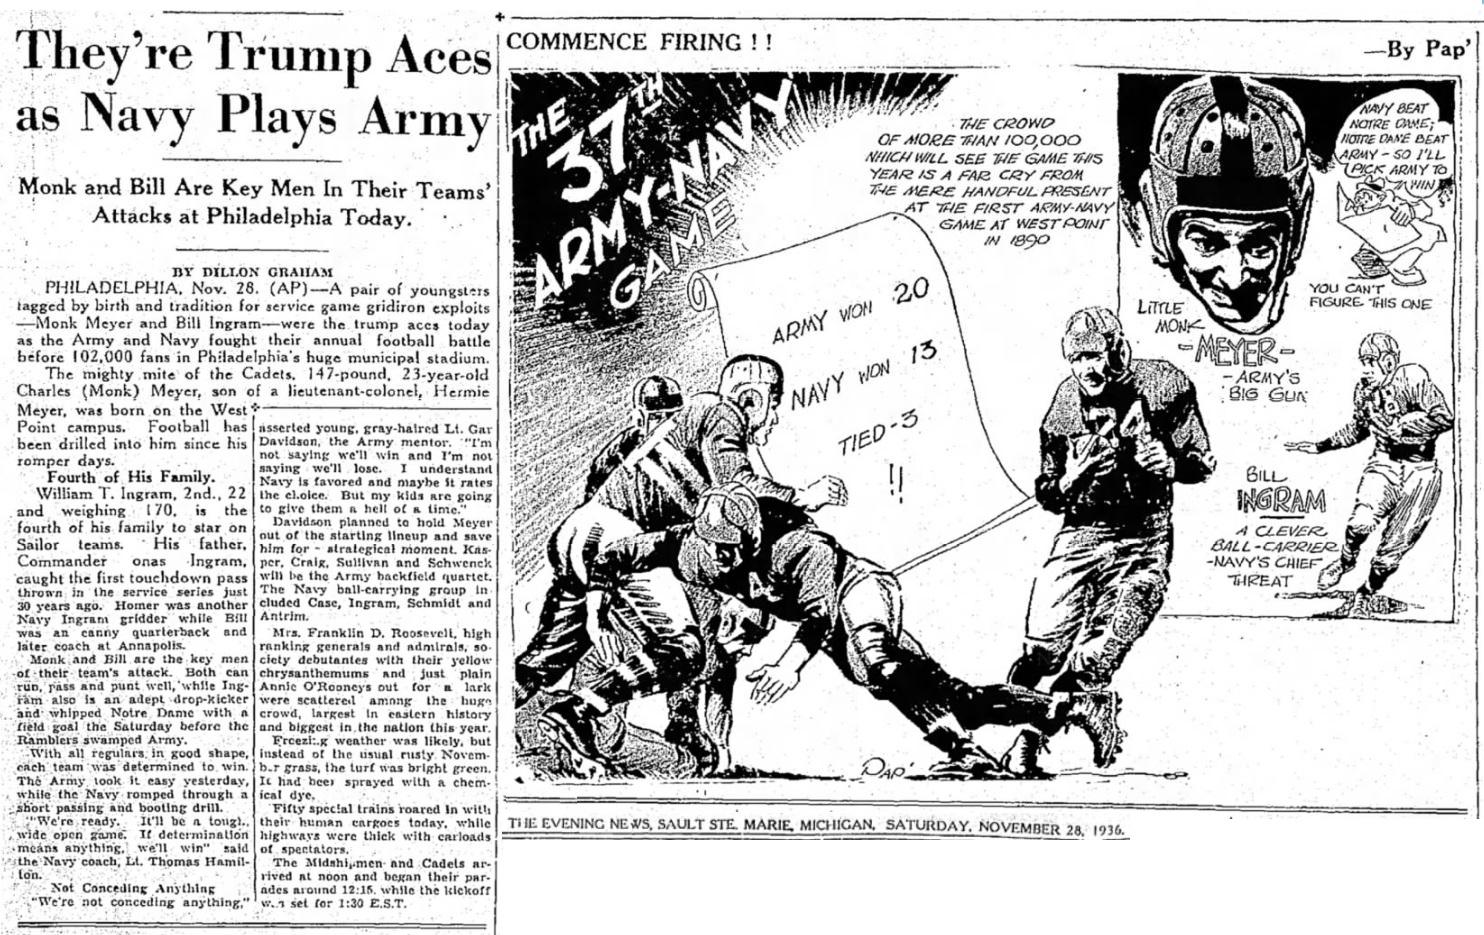 armyfb_1936_vsnavy_eveningnewssaulsaintemariemi_nov281936